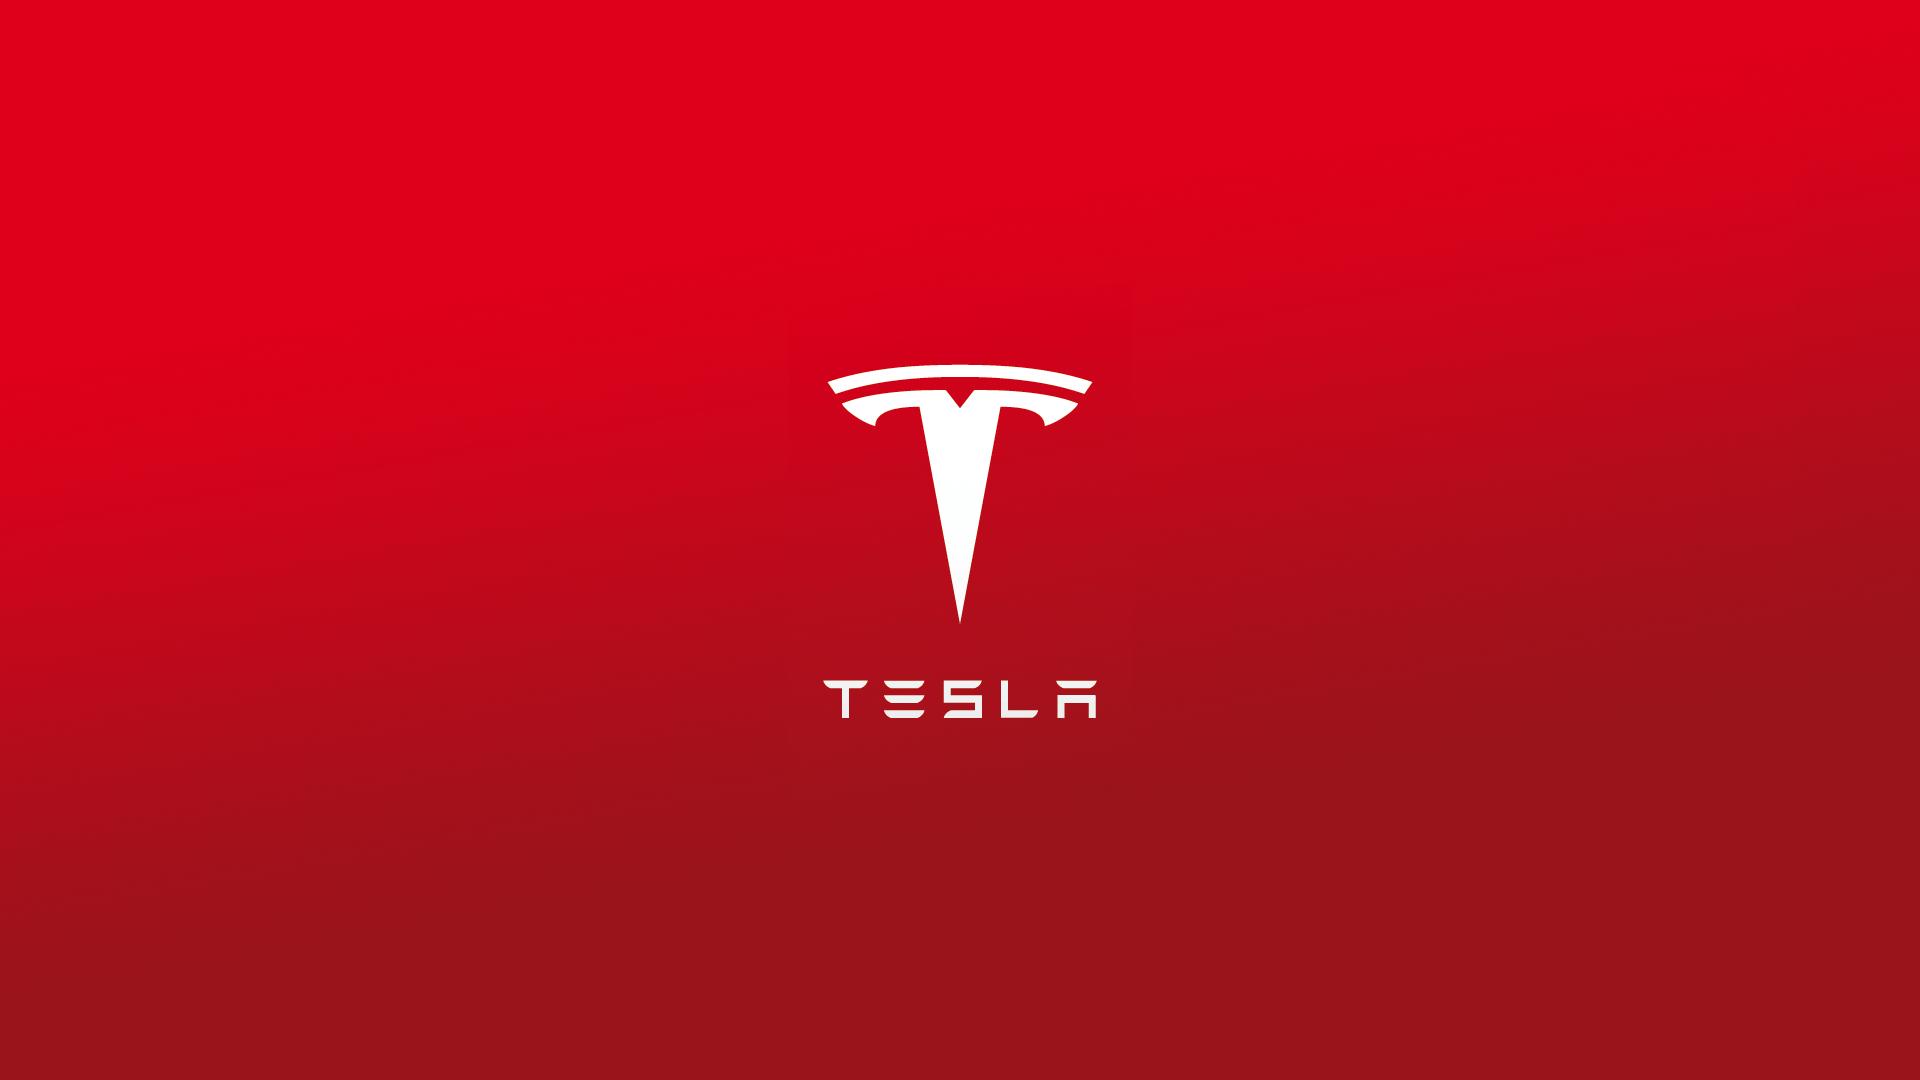 Tesla HD Background